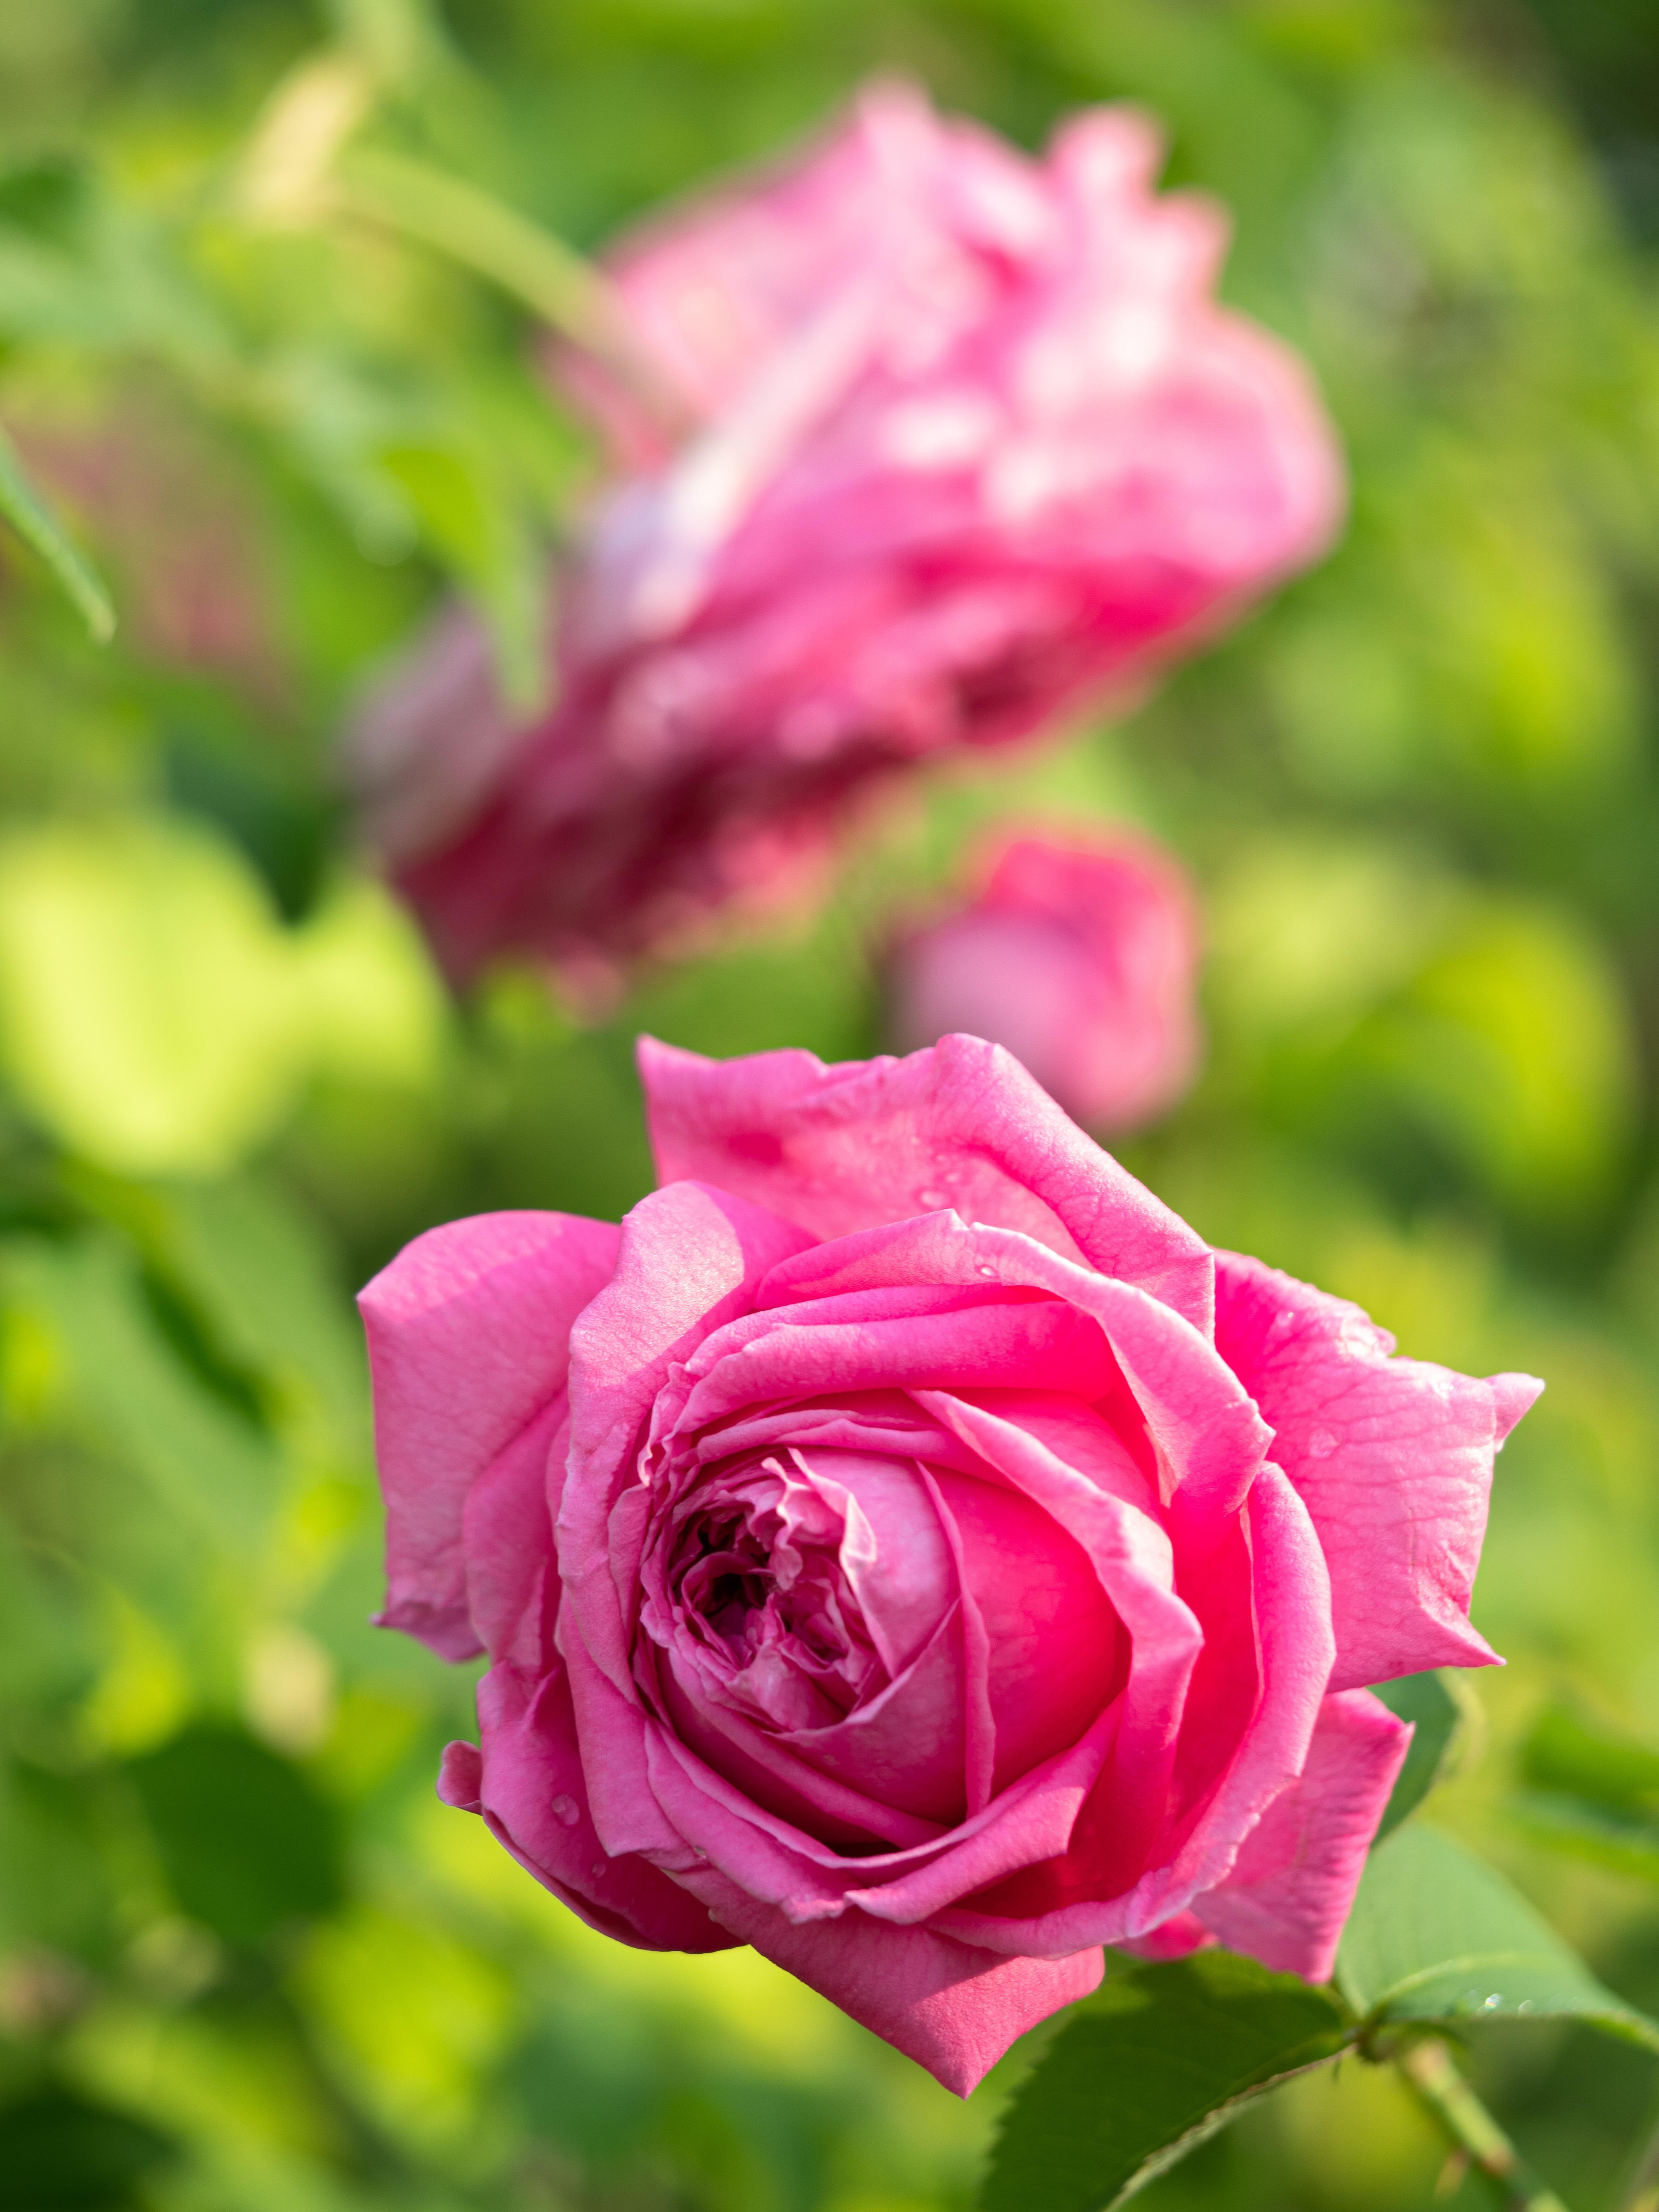 My Rose Garden in July #12